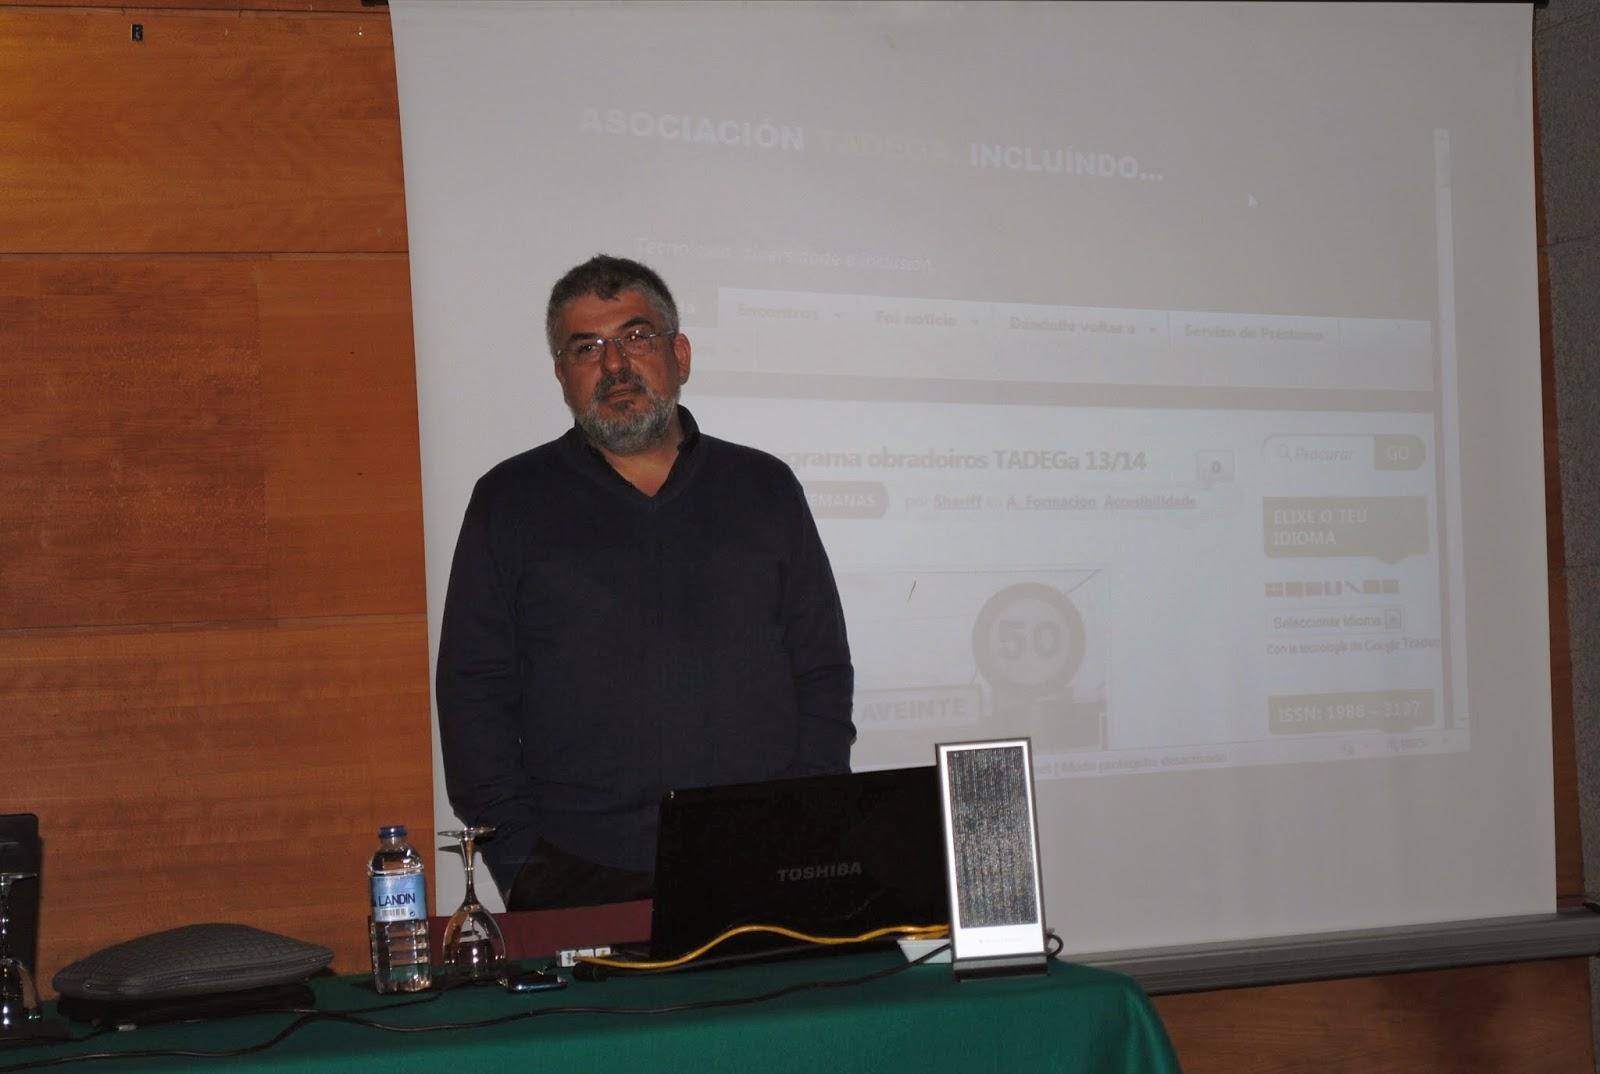 Imagen de Juan el presidente de TADEGA